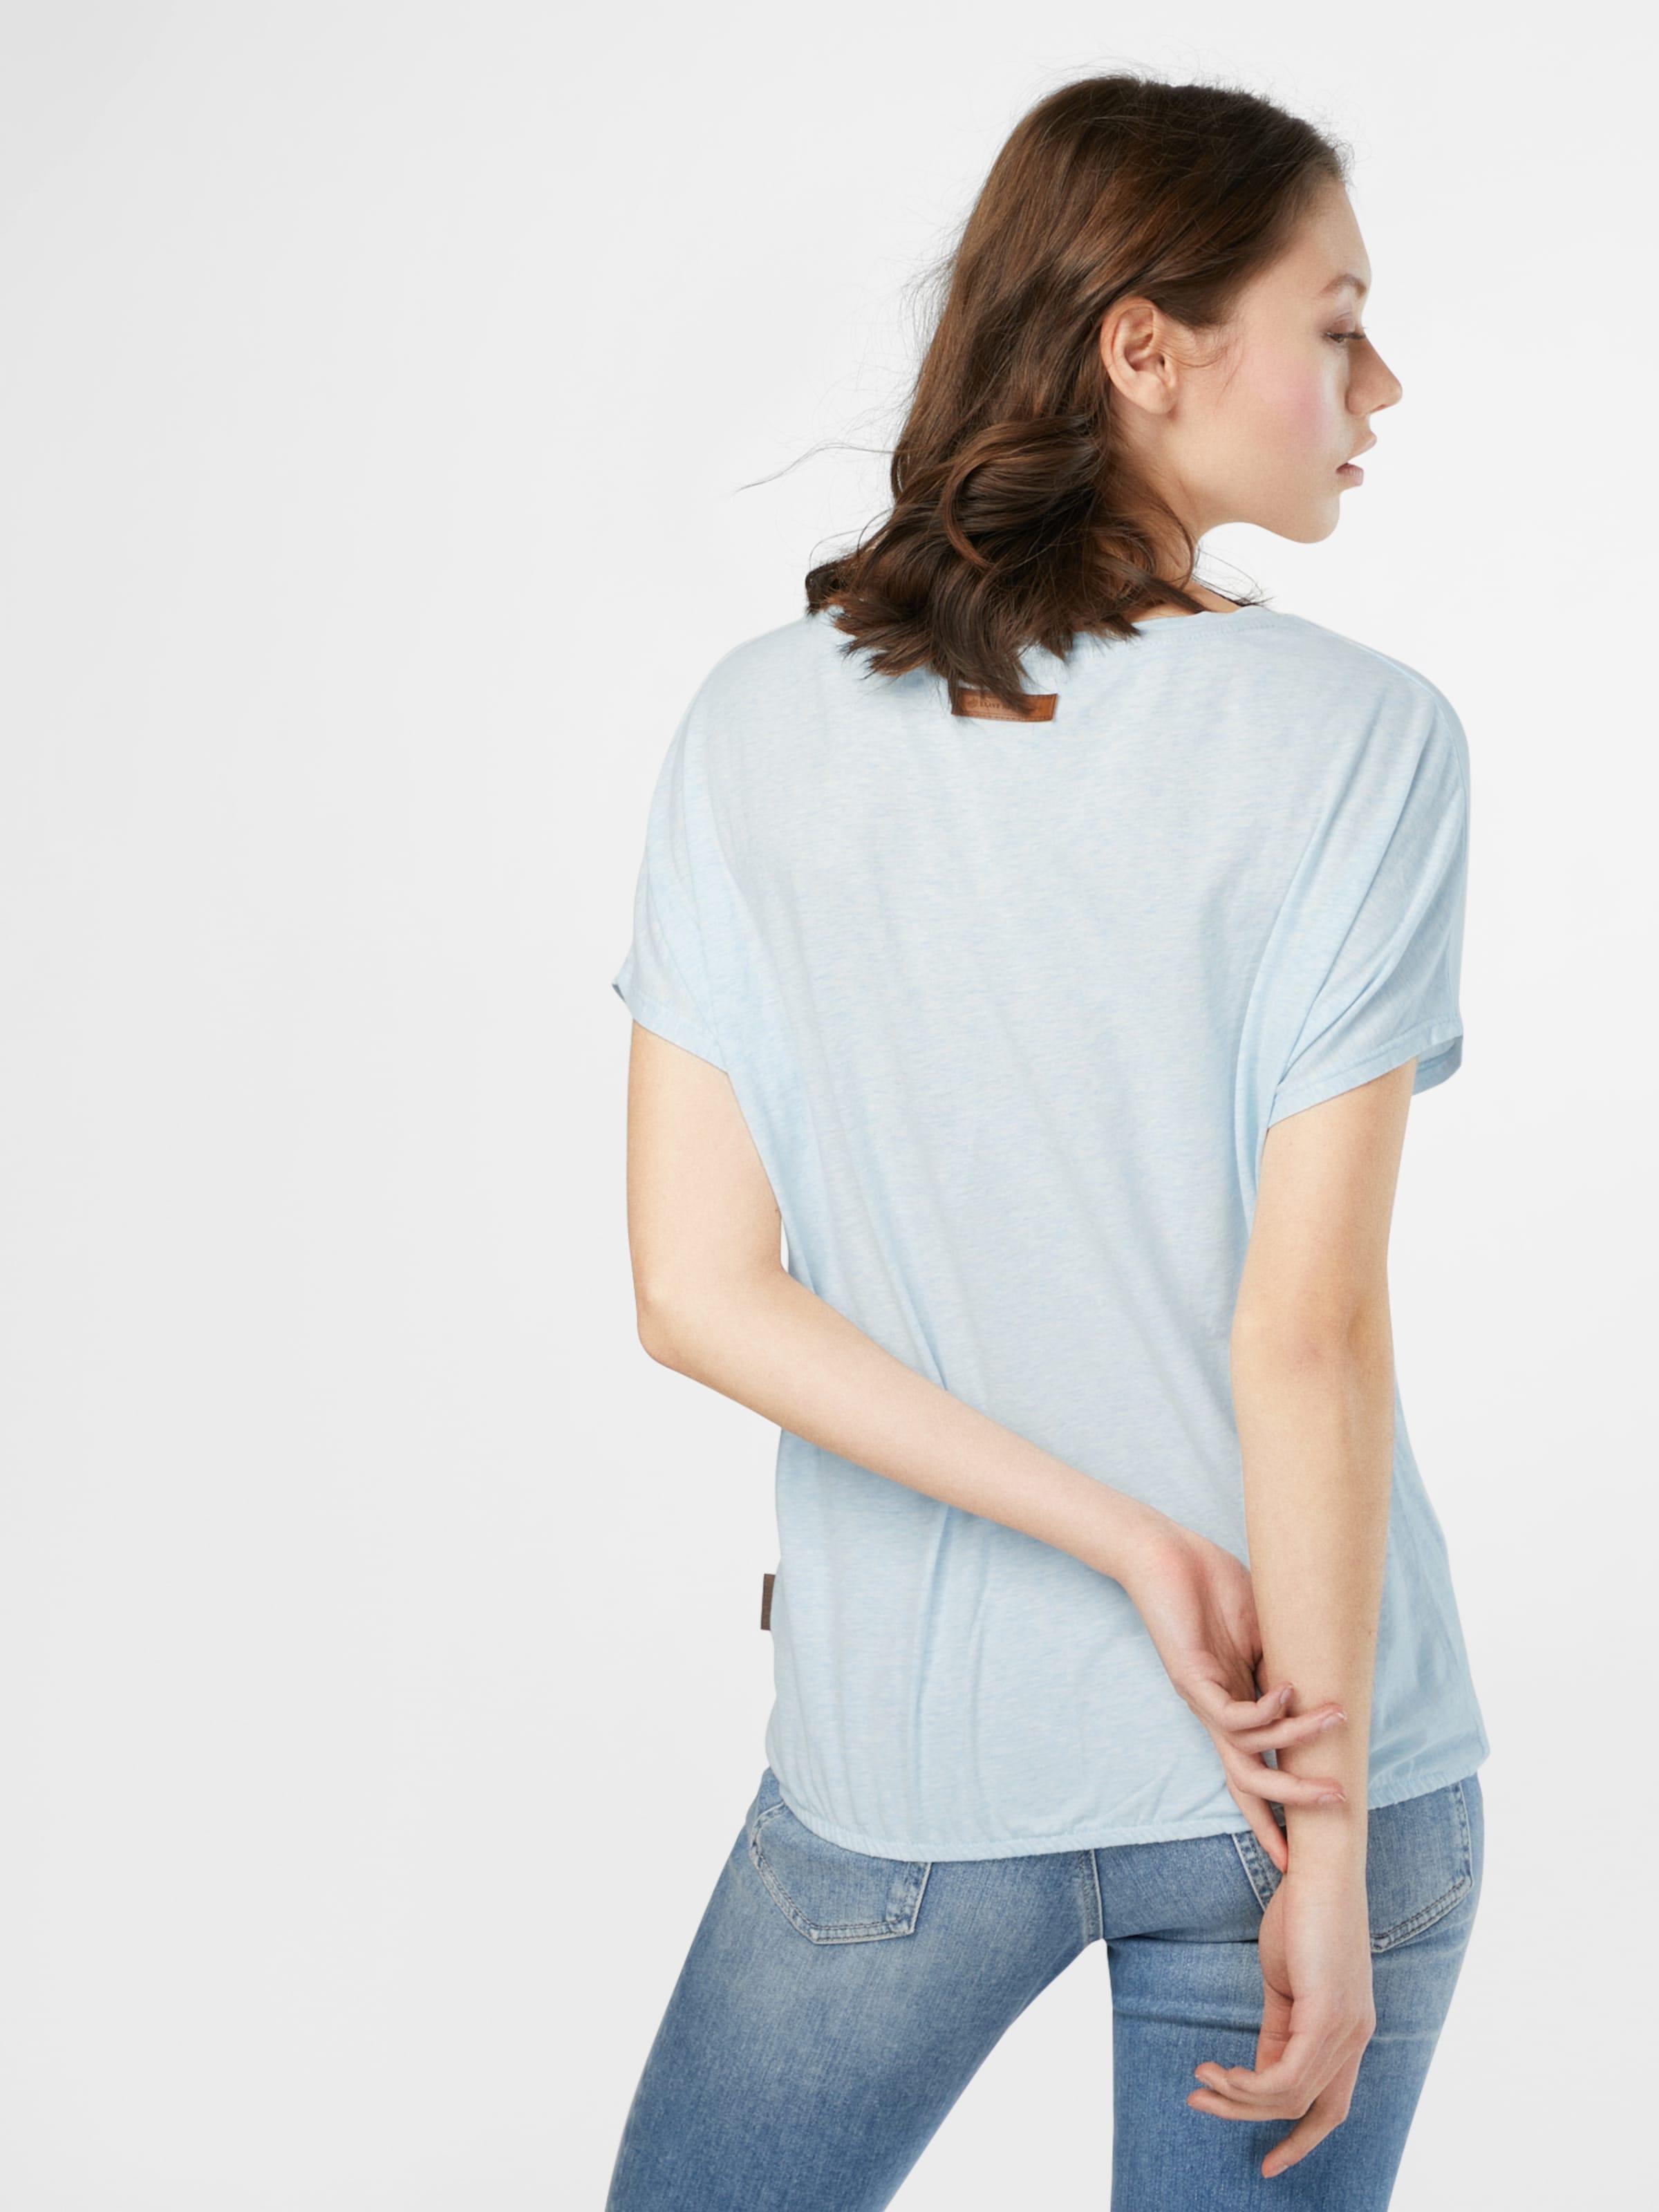 Baustella Blau Naketano Iii' In Shirt 'schnella T3JlFKcu1